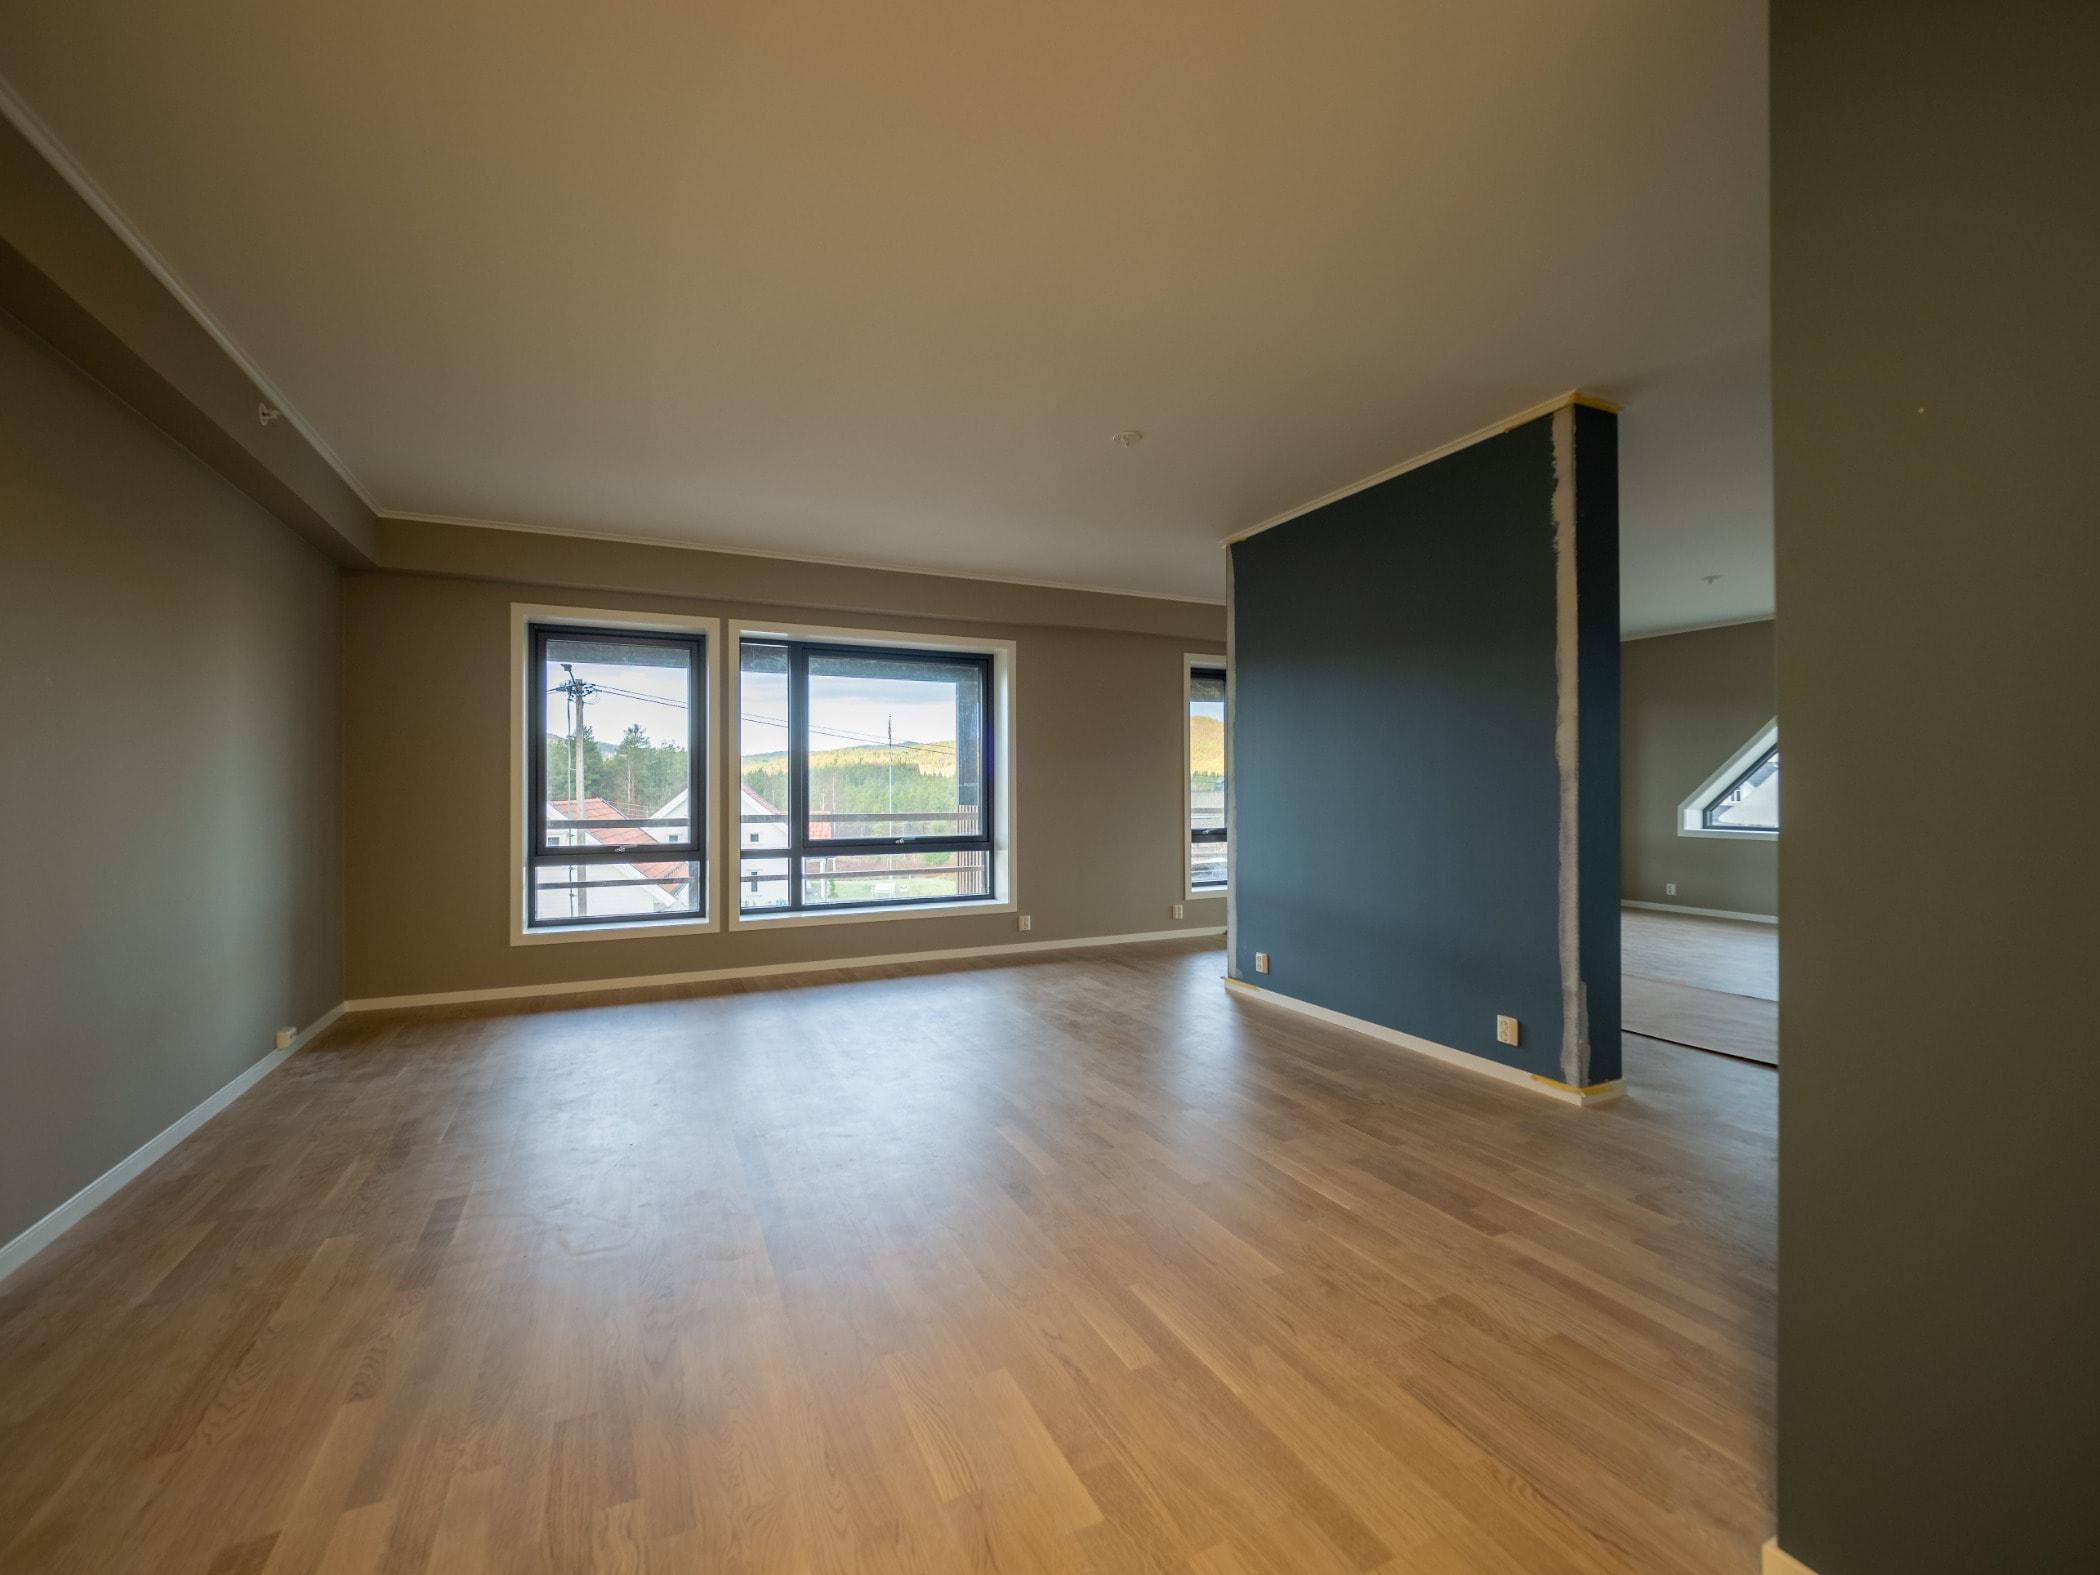 Wood flooring, Daylighting, Building, Hardwood, Property, Room, Floor